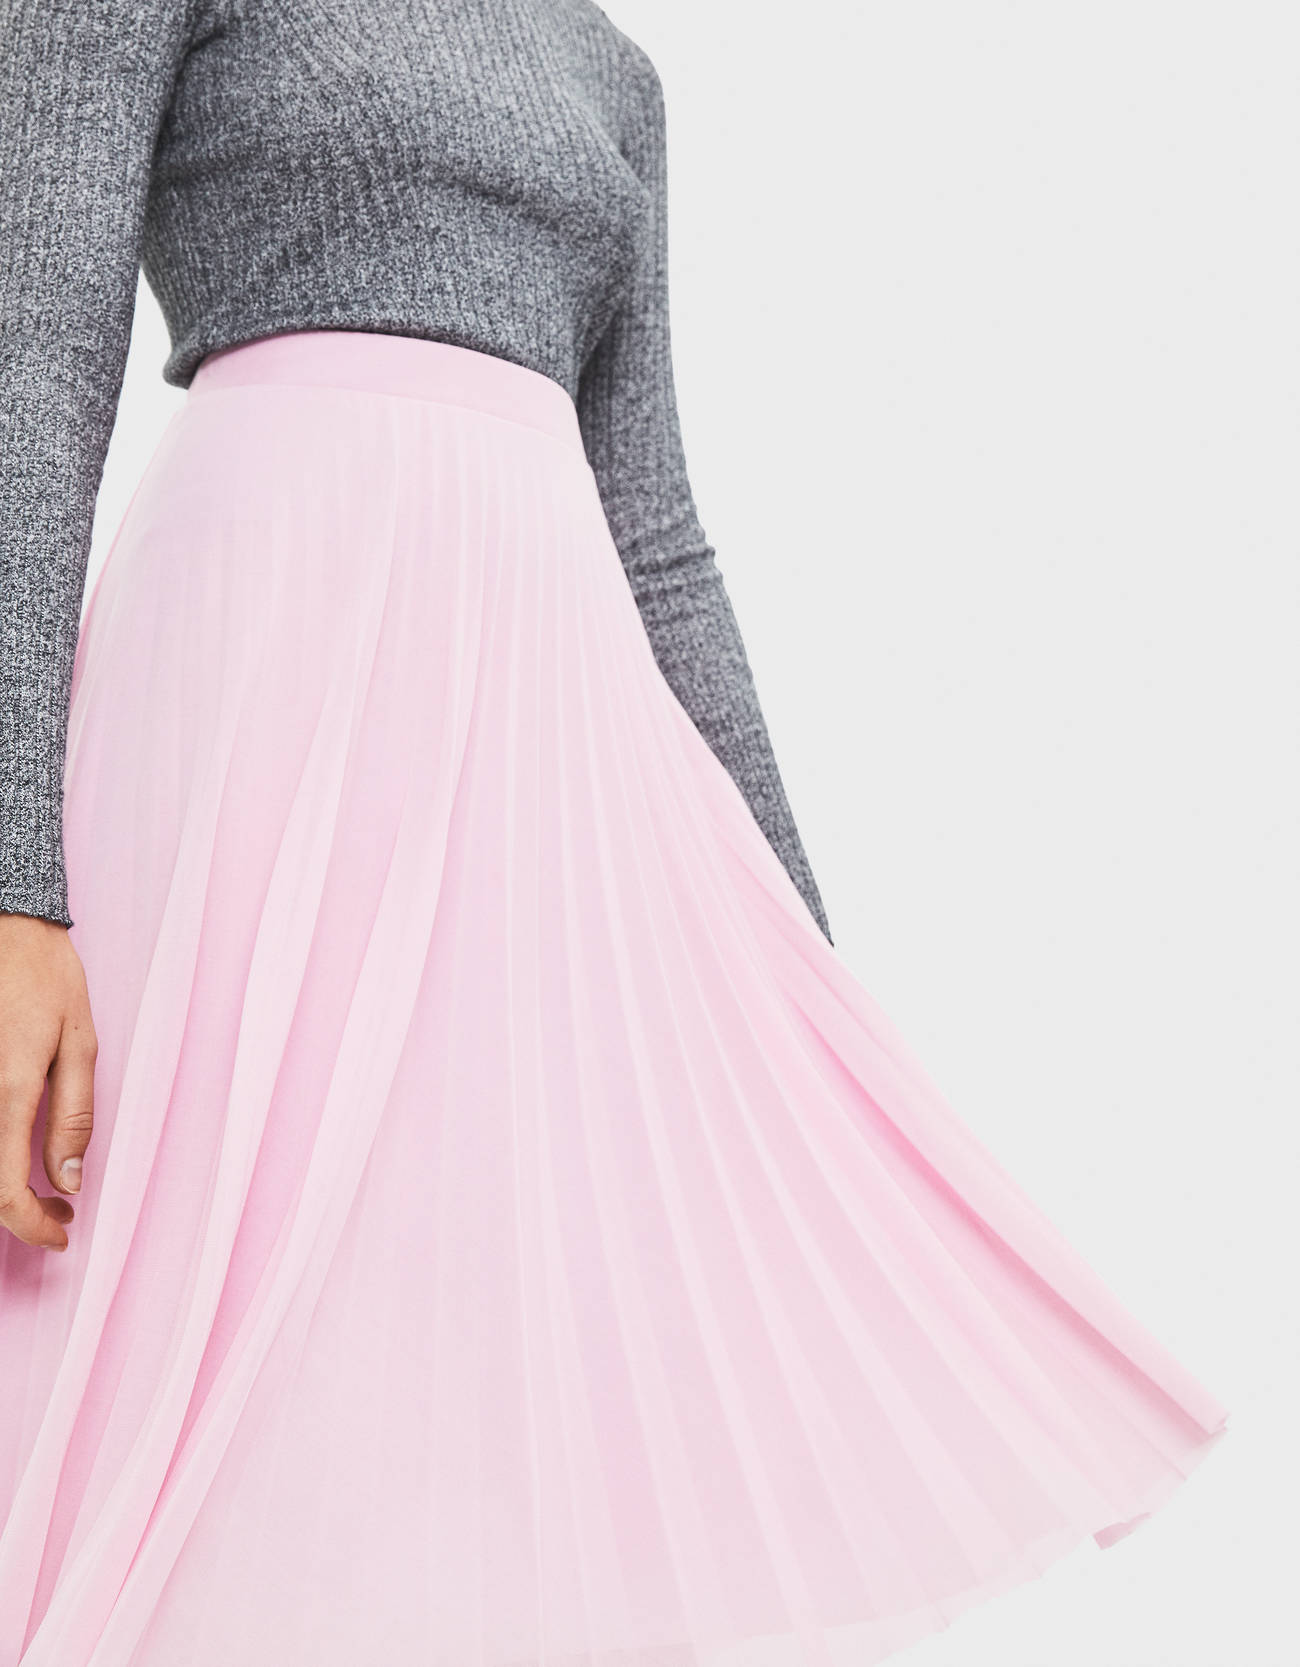 d05fa4cf7 Pleated tulle midi skirt - BSK Teen - Bershka Italy